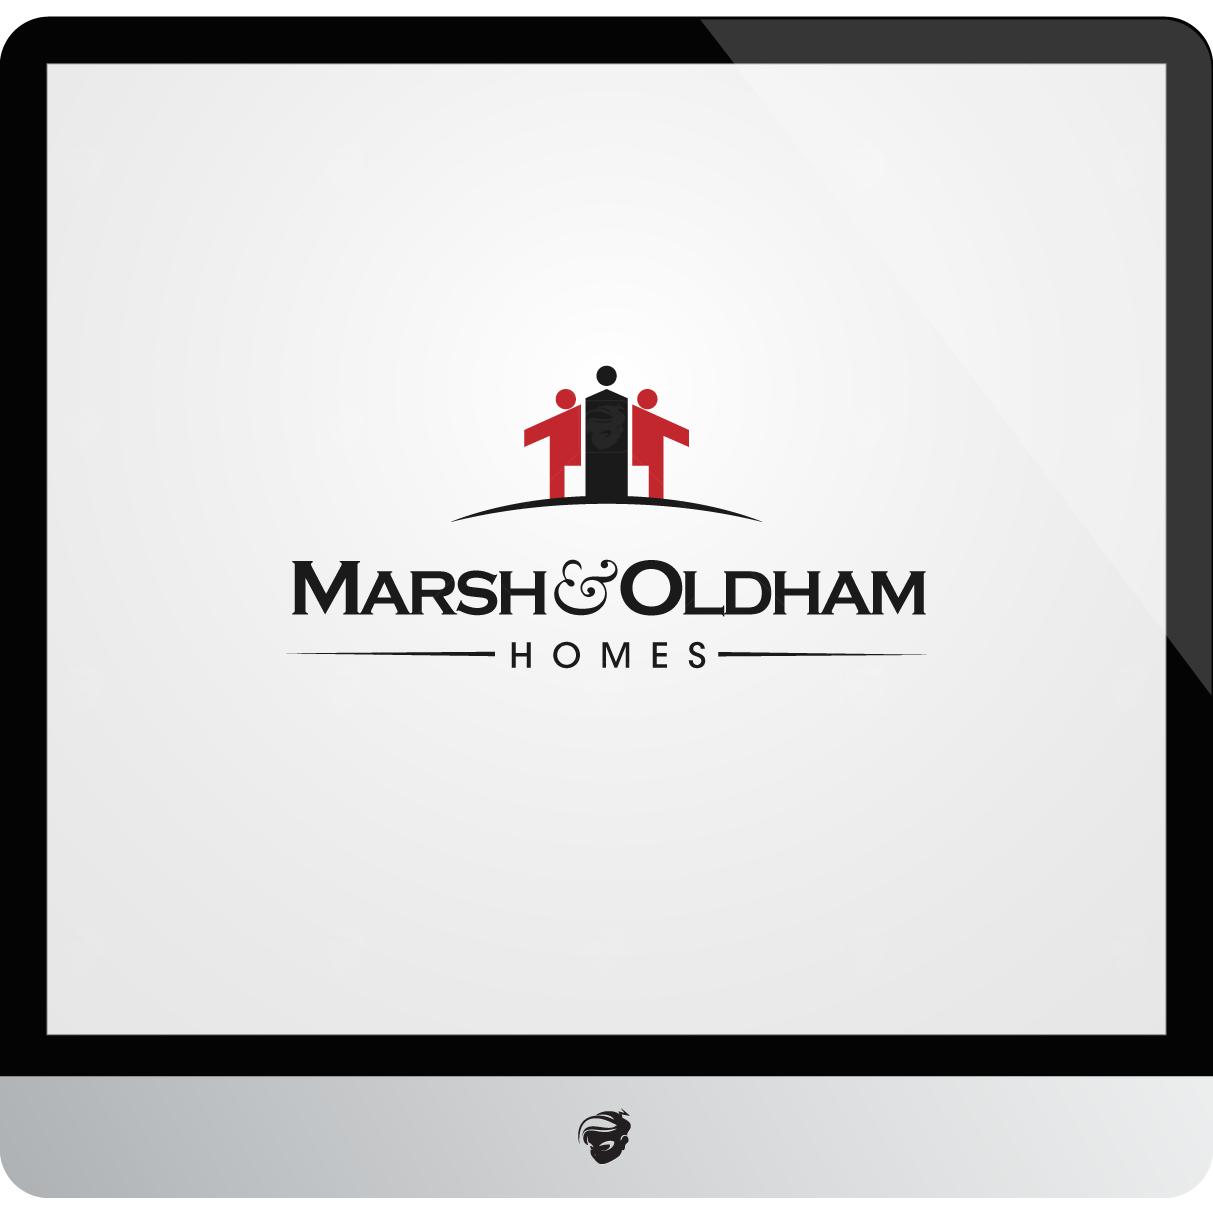 Logo Design by zesthar - Entry No. 203 in the Logo Design Contest Artistic Logo Design for Marsh & Oldham Homes.